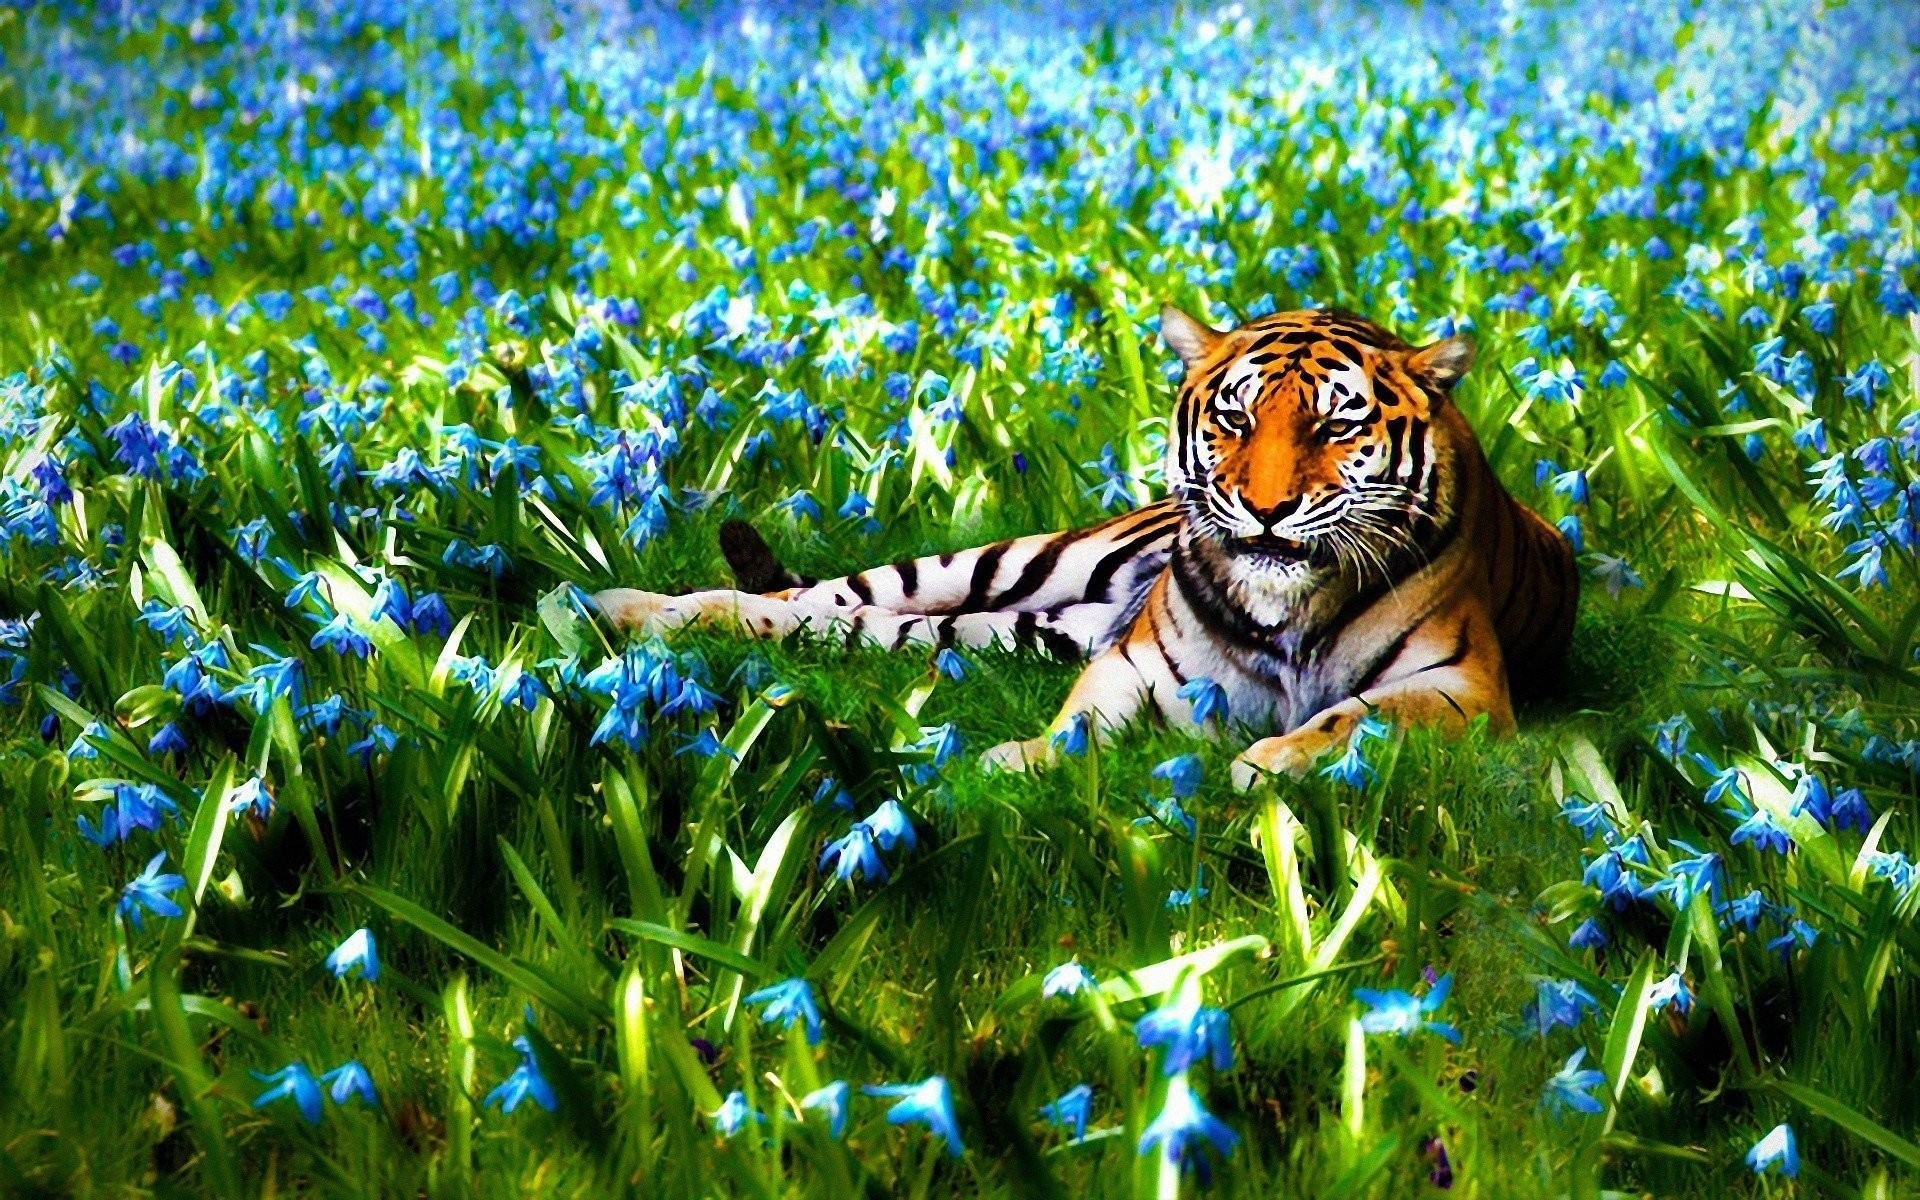 Beautiful Nature – Wallpaper Hd 3d Nature – cool cute nature animal  wallpaper by md.sopon1